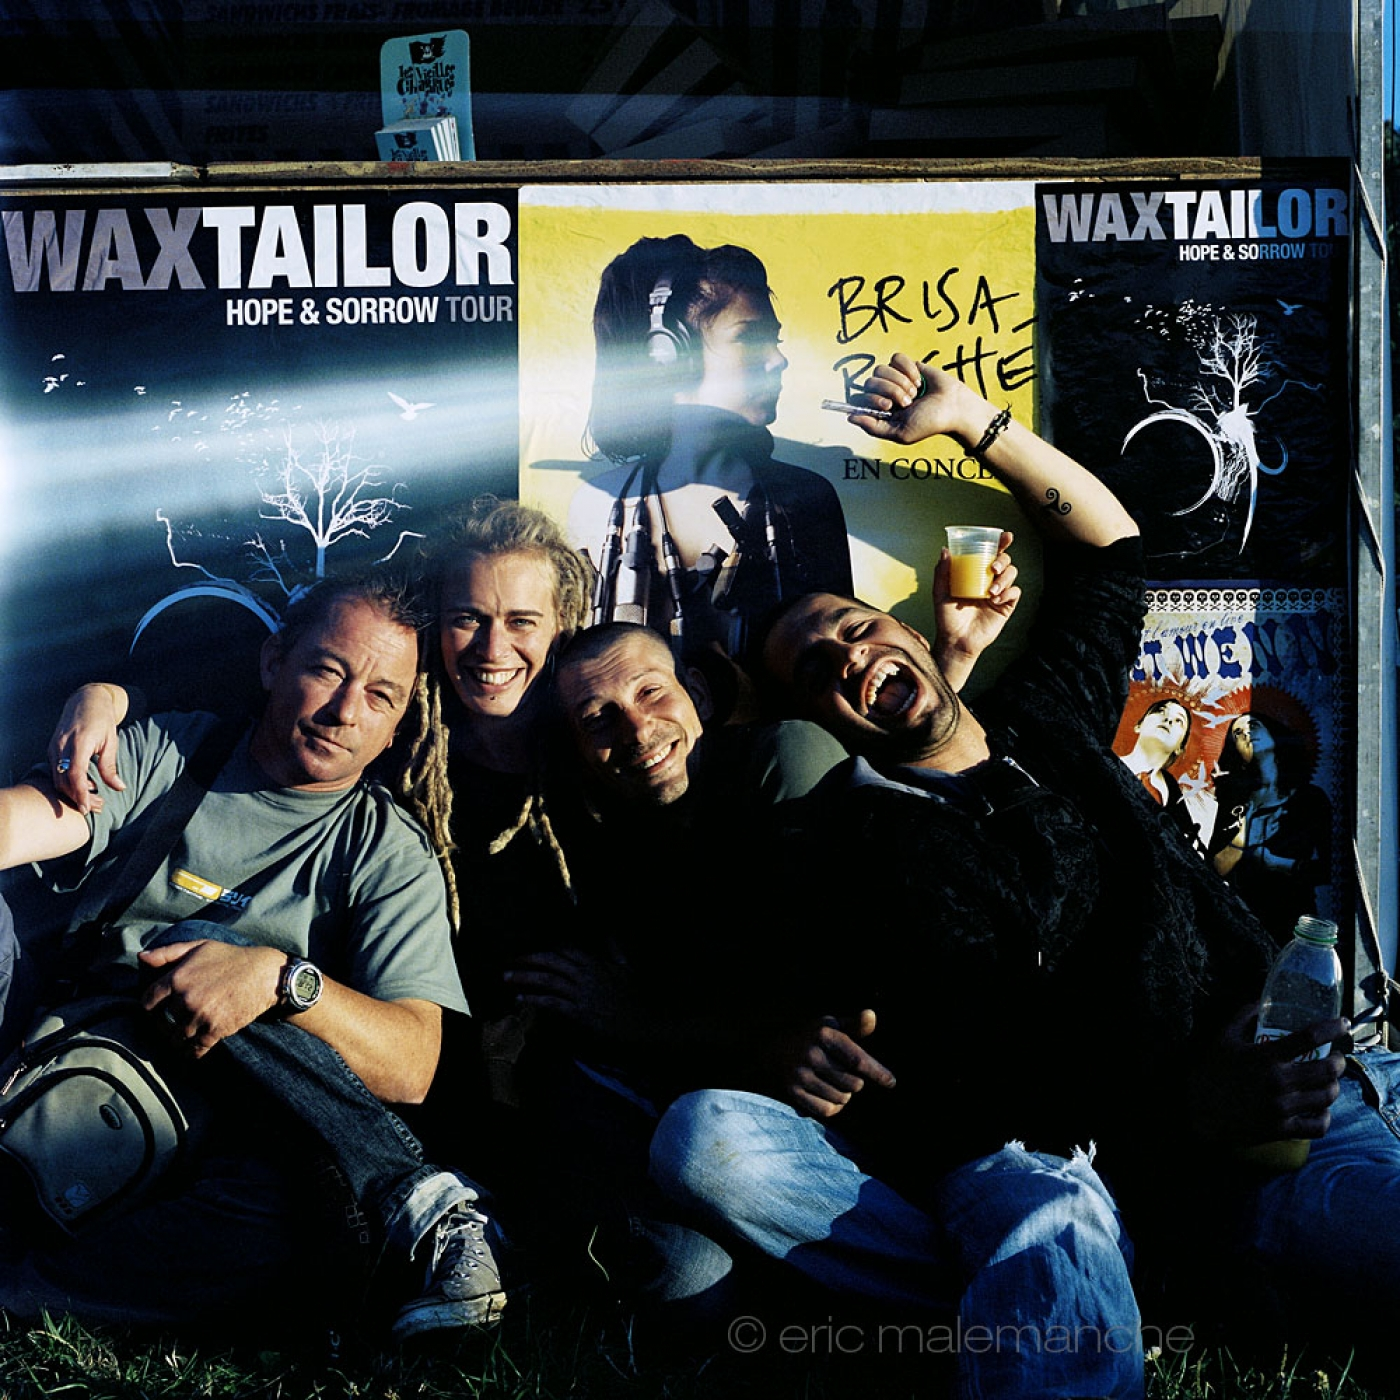 https://www.ericmalemanche.com/imagess/topics/rock-and-roll-attitudes/liste/rockandroll-attitudes-malemanche-006.jpg